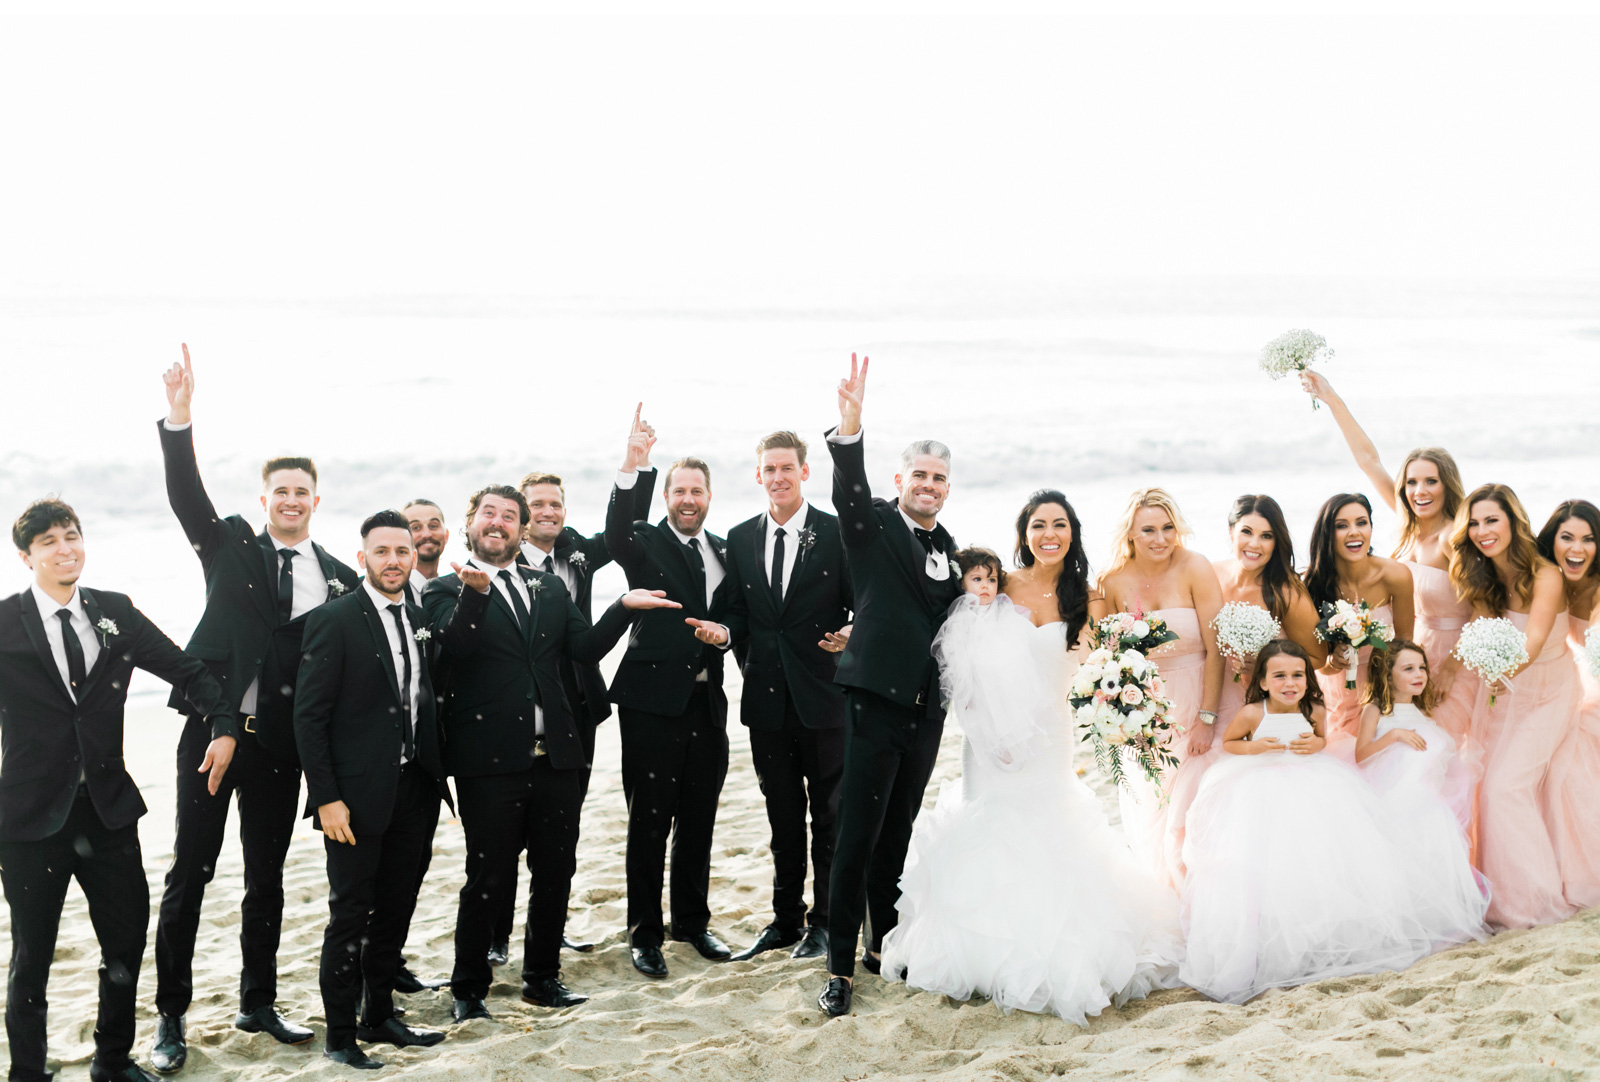 Sunset-Restaurant-Malibu-Beach-Wedding-Natalie-Schutt-Photography_02.jpg